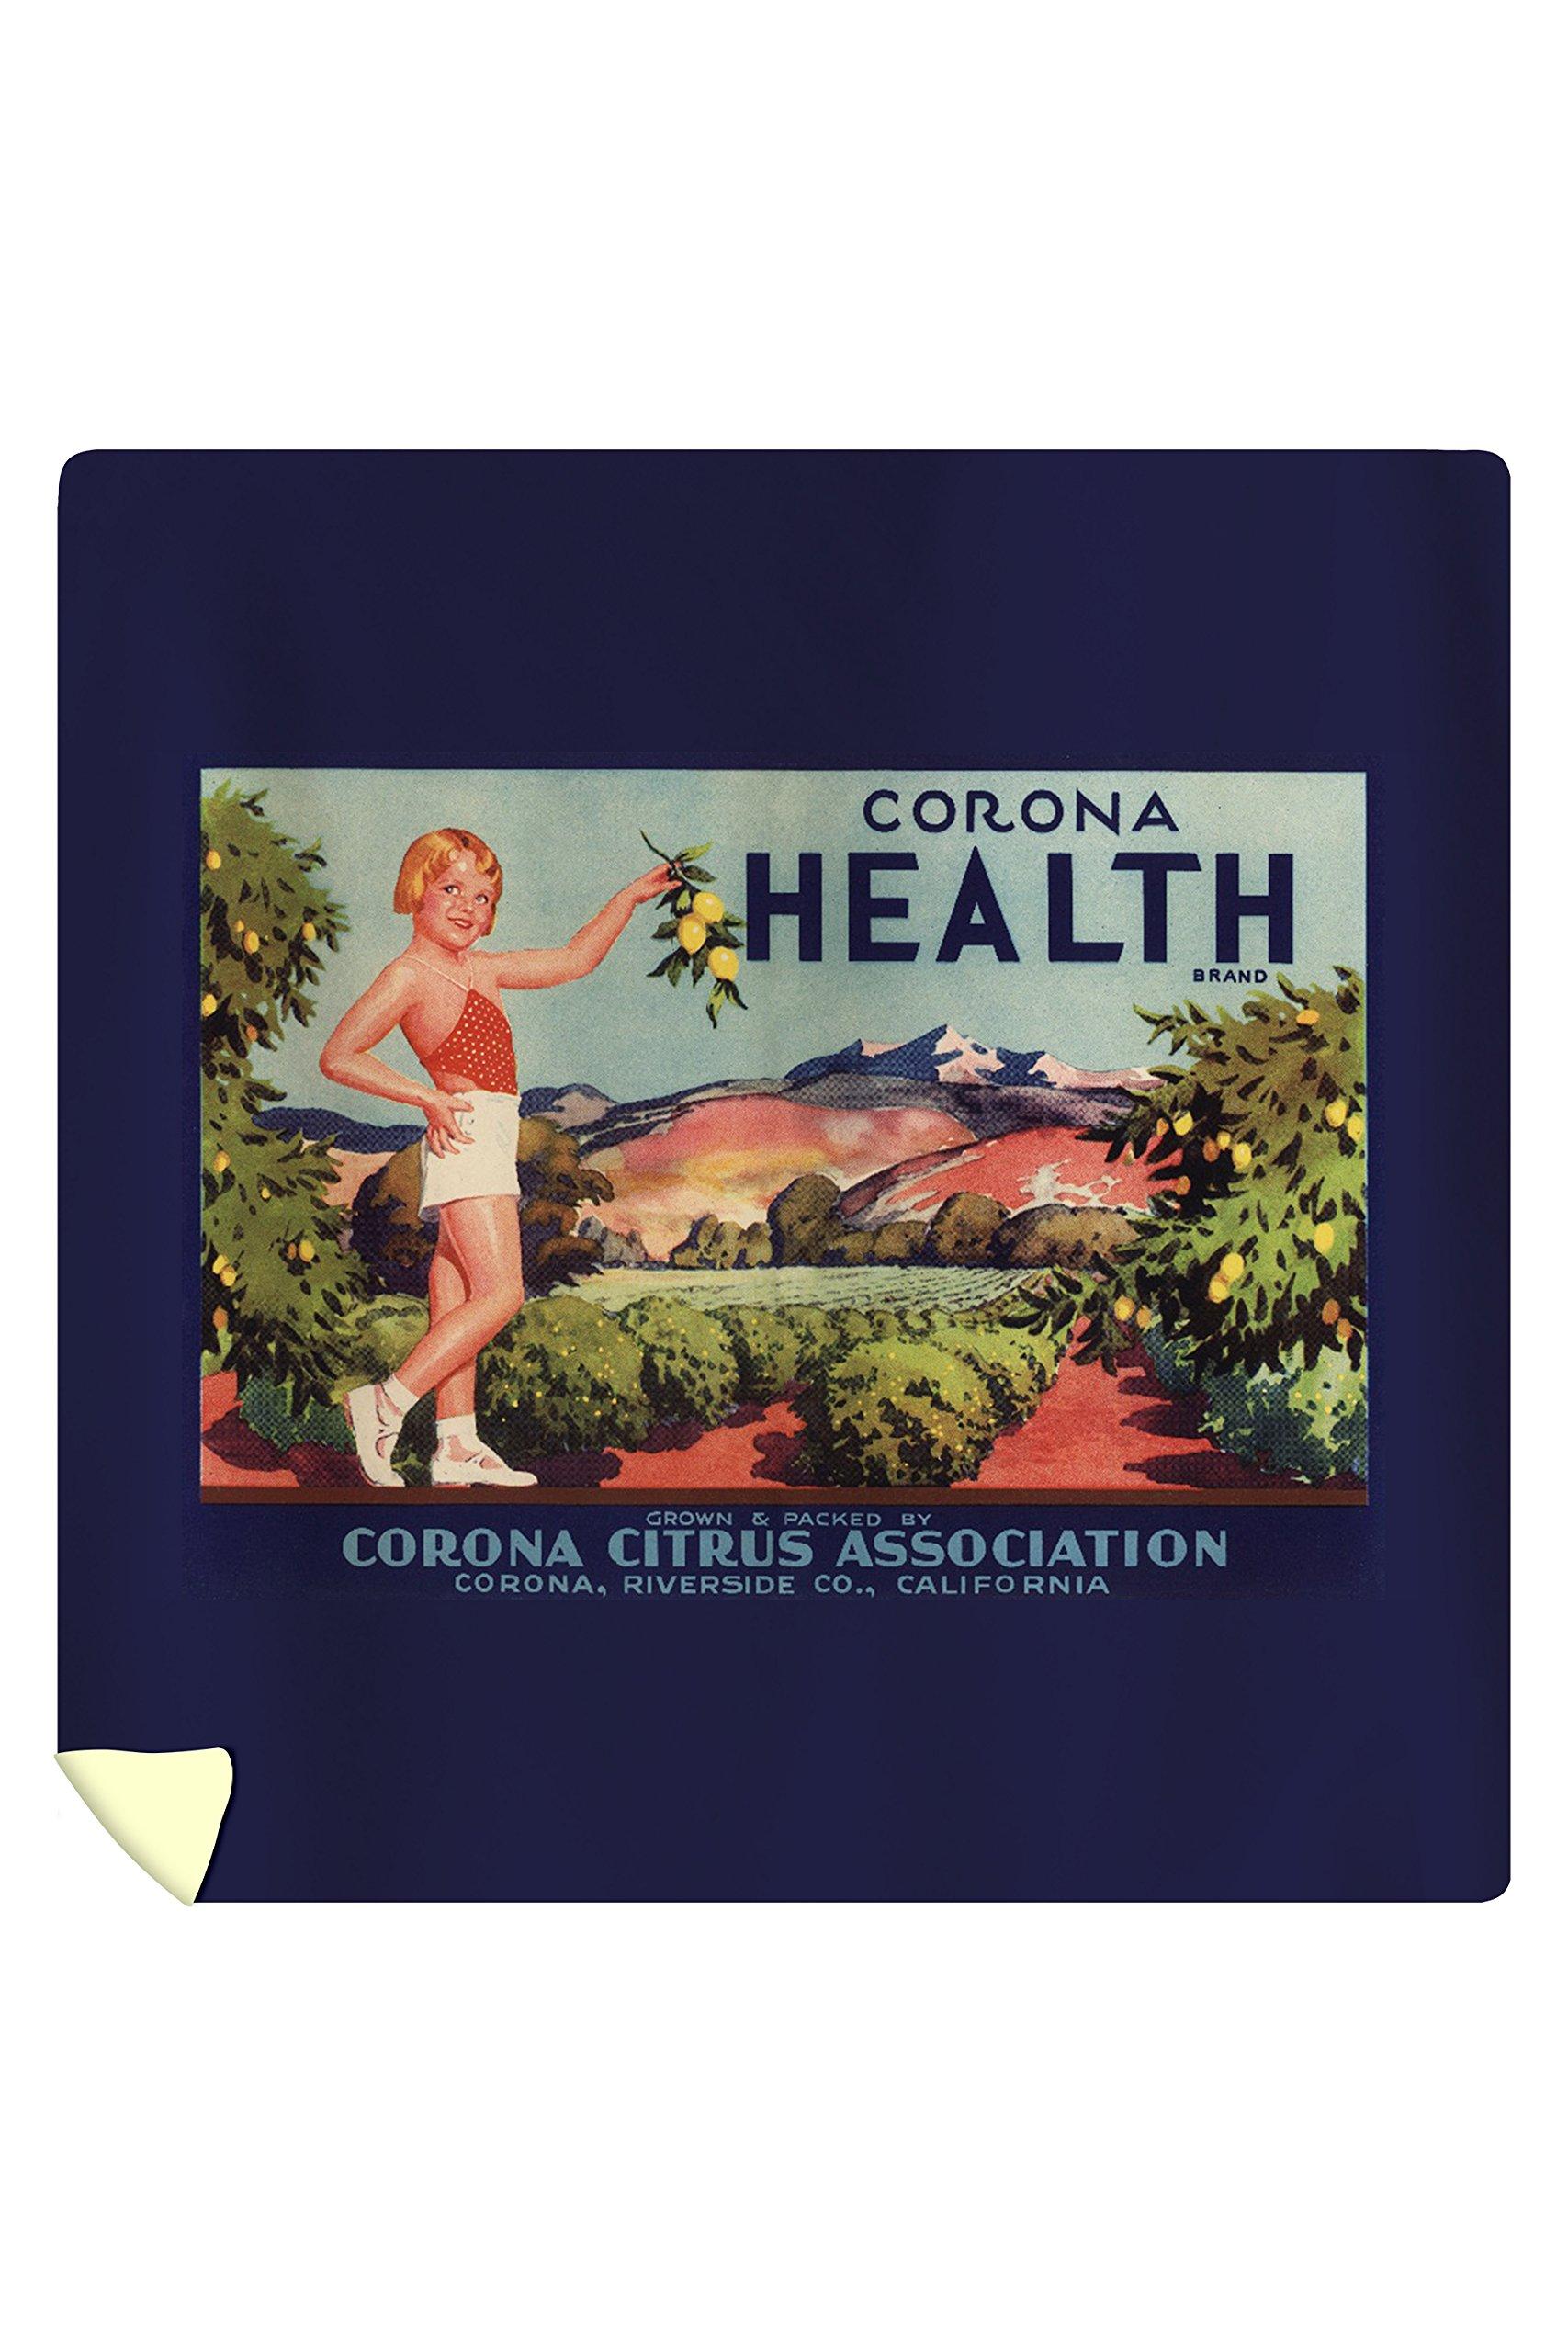 Corona Health Brand - Corona, California - Citrus Crate Label (88x88 Queen Microfiber Duvet Cover)